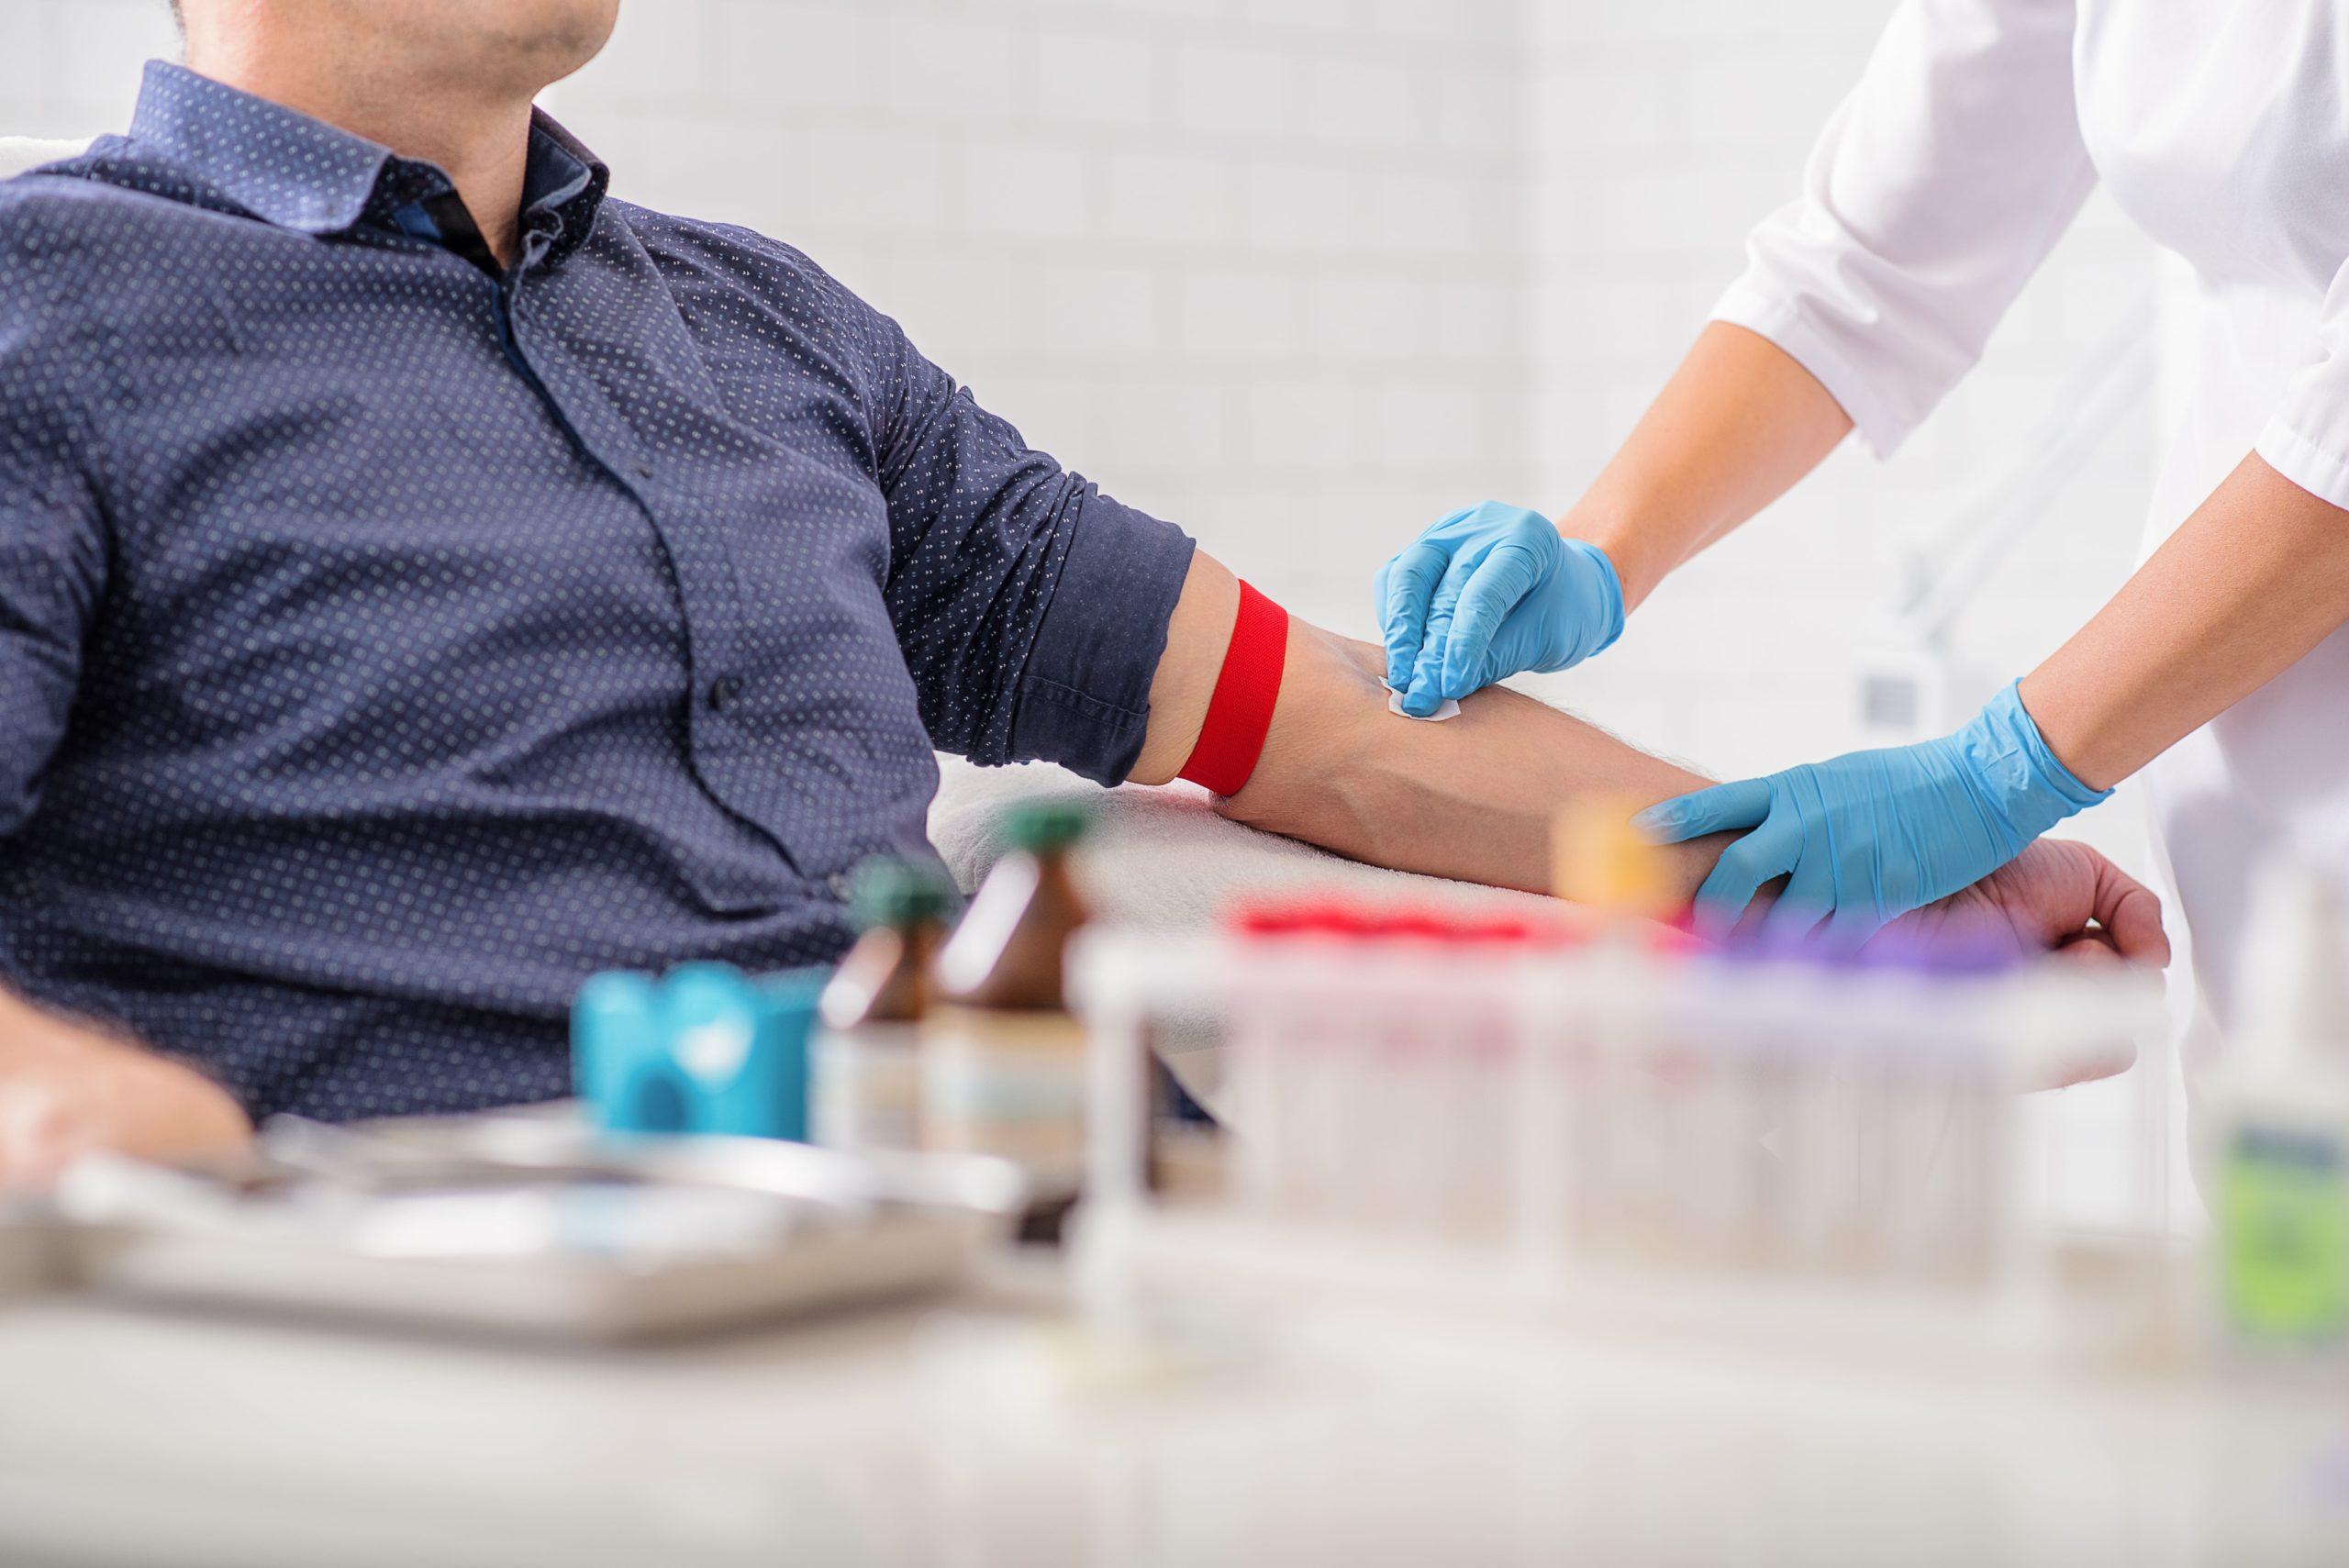 Análisis de sangre detecta cáncer